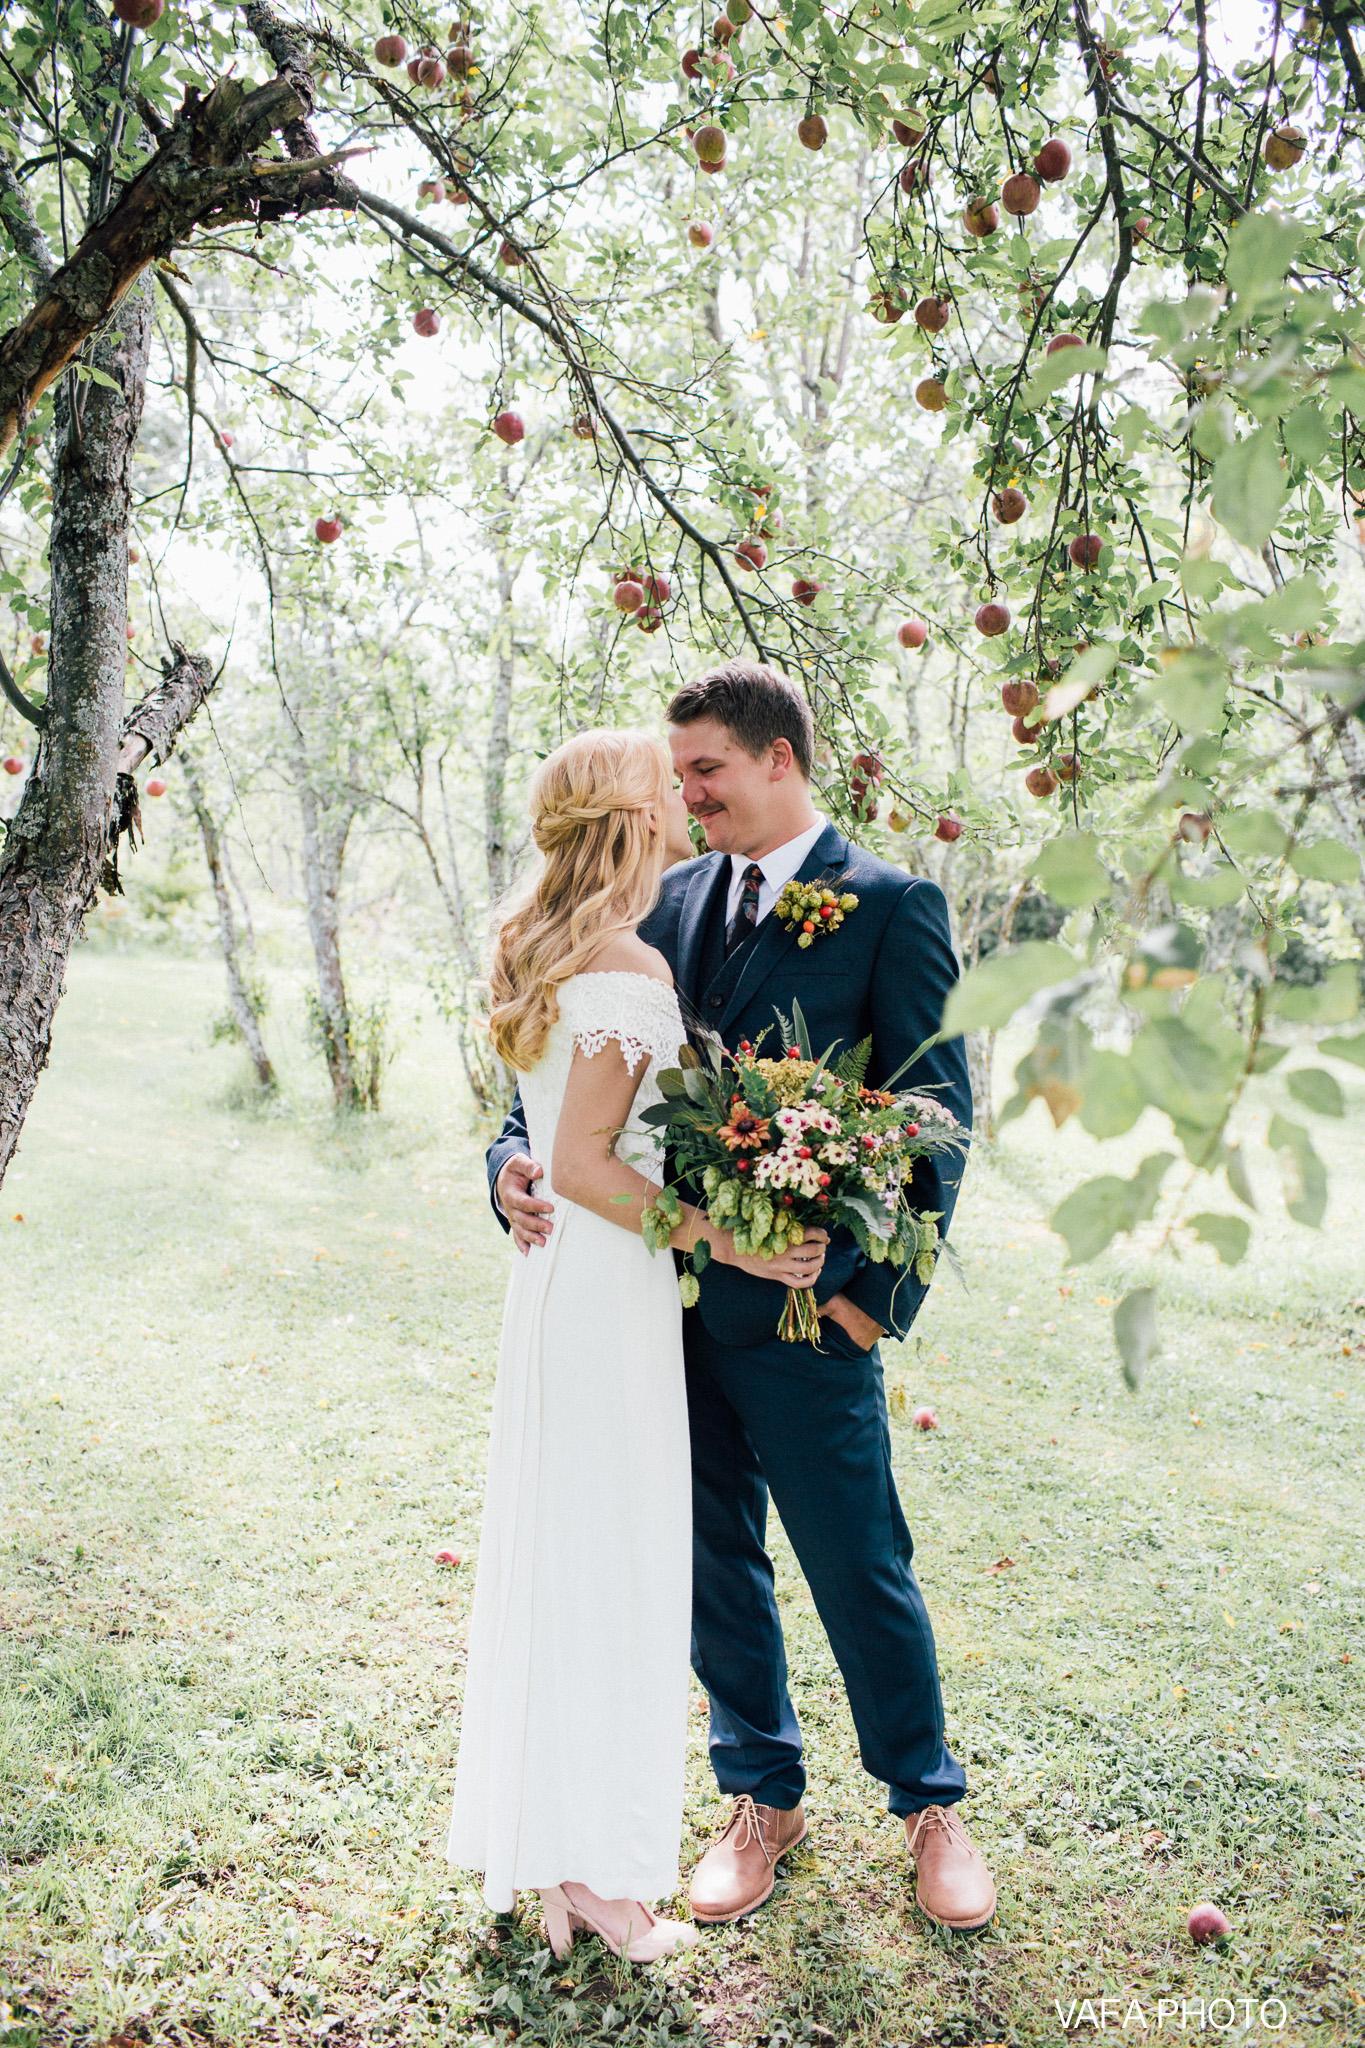 Belsolda-Farm-Wedding-Christy-Eric-Vafa-Photo-79.jpg